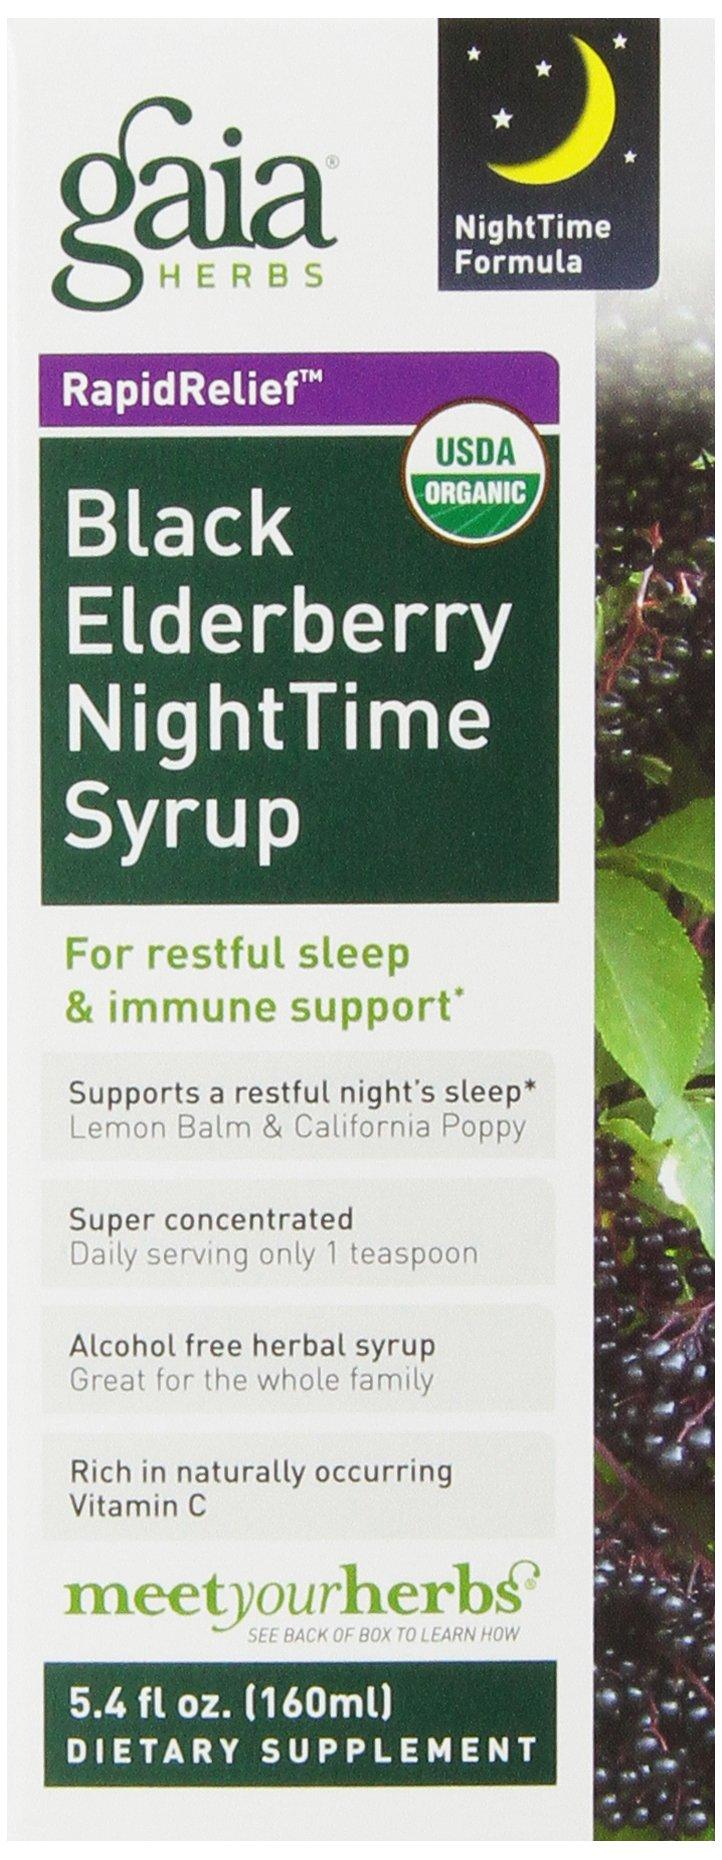 Gaia Herbs Black Elderberry NightTime Syrup, 5.4-Ounce Bottle